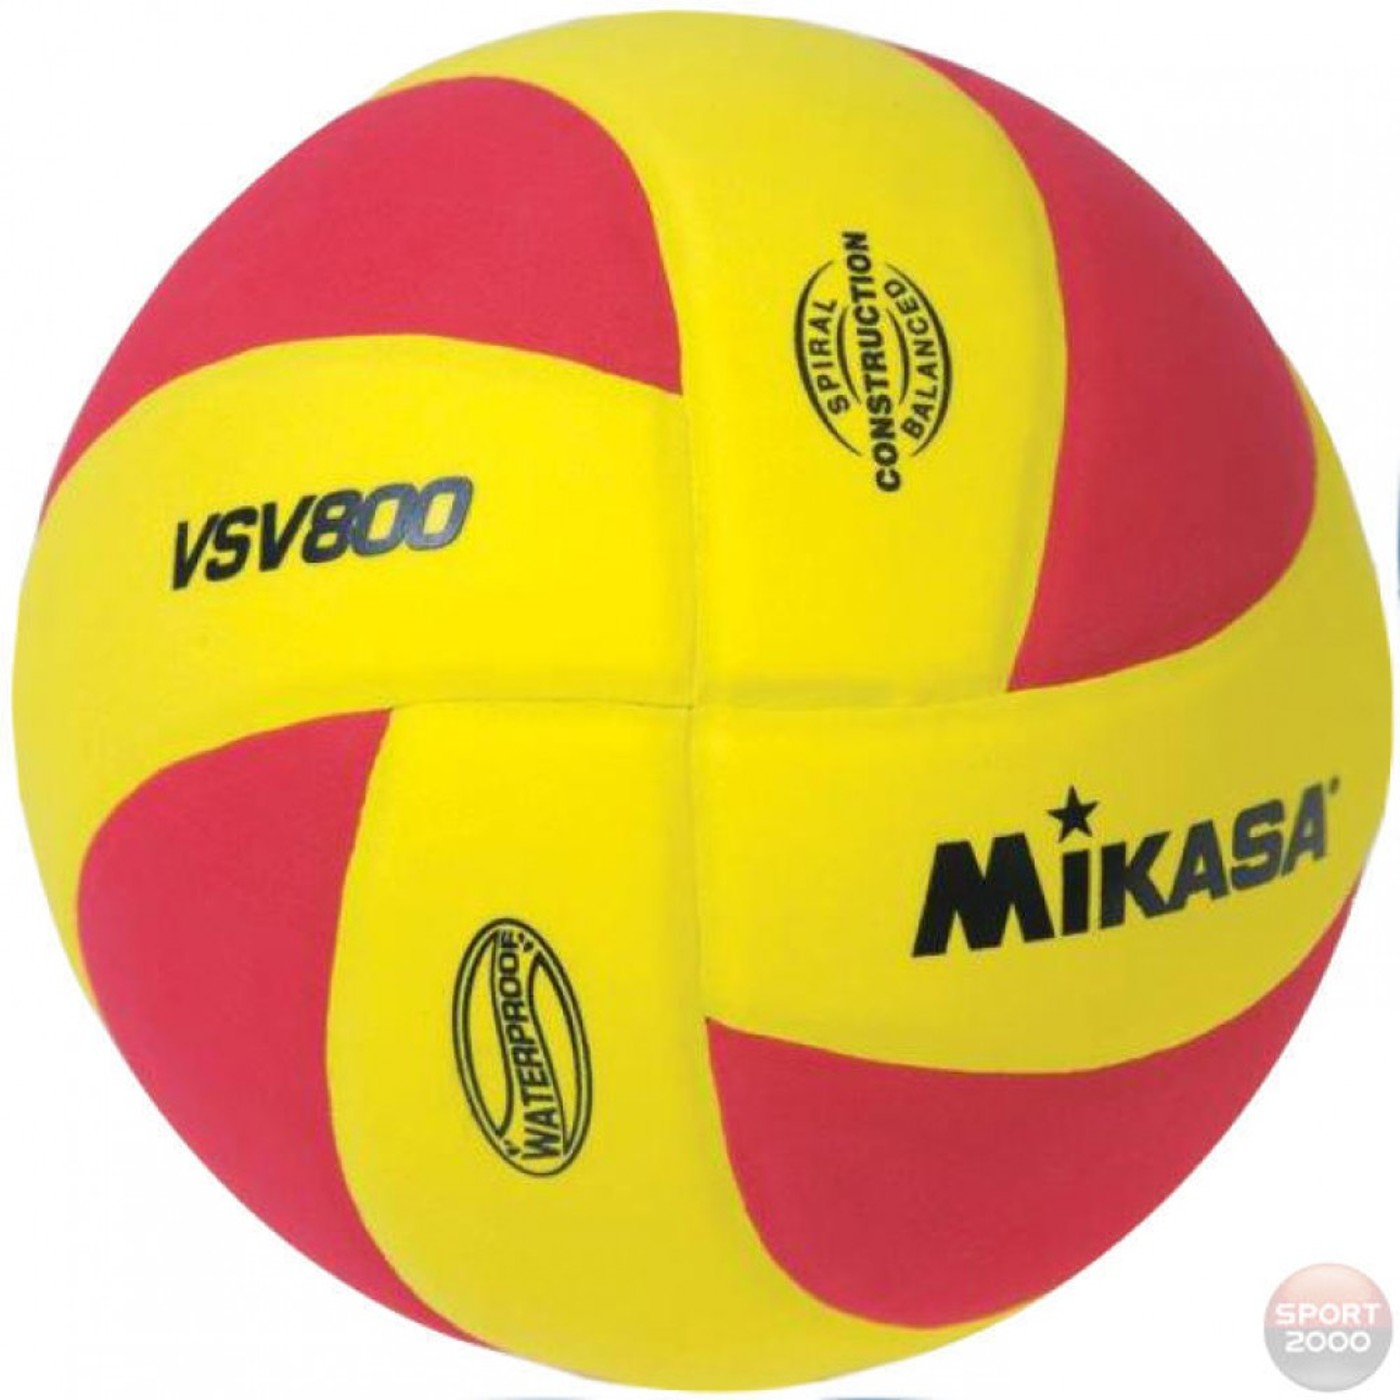 MIKASA Volleyball VSV800